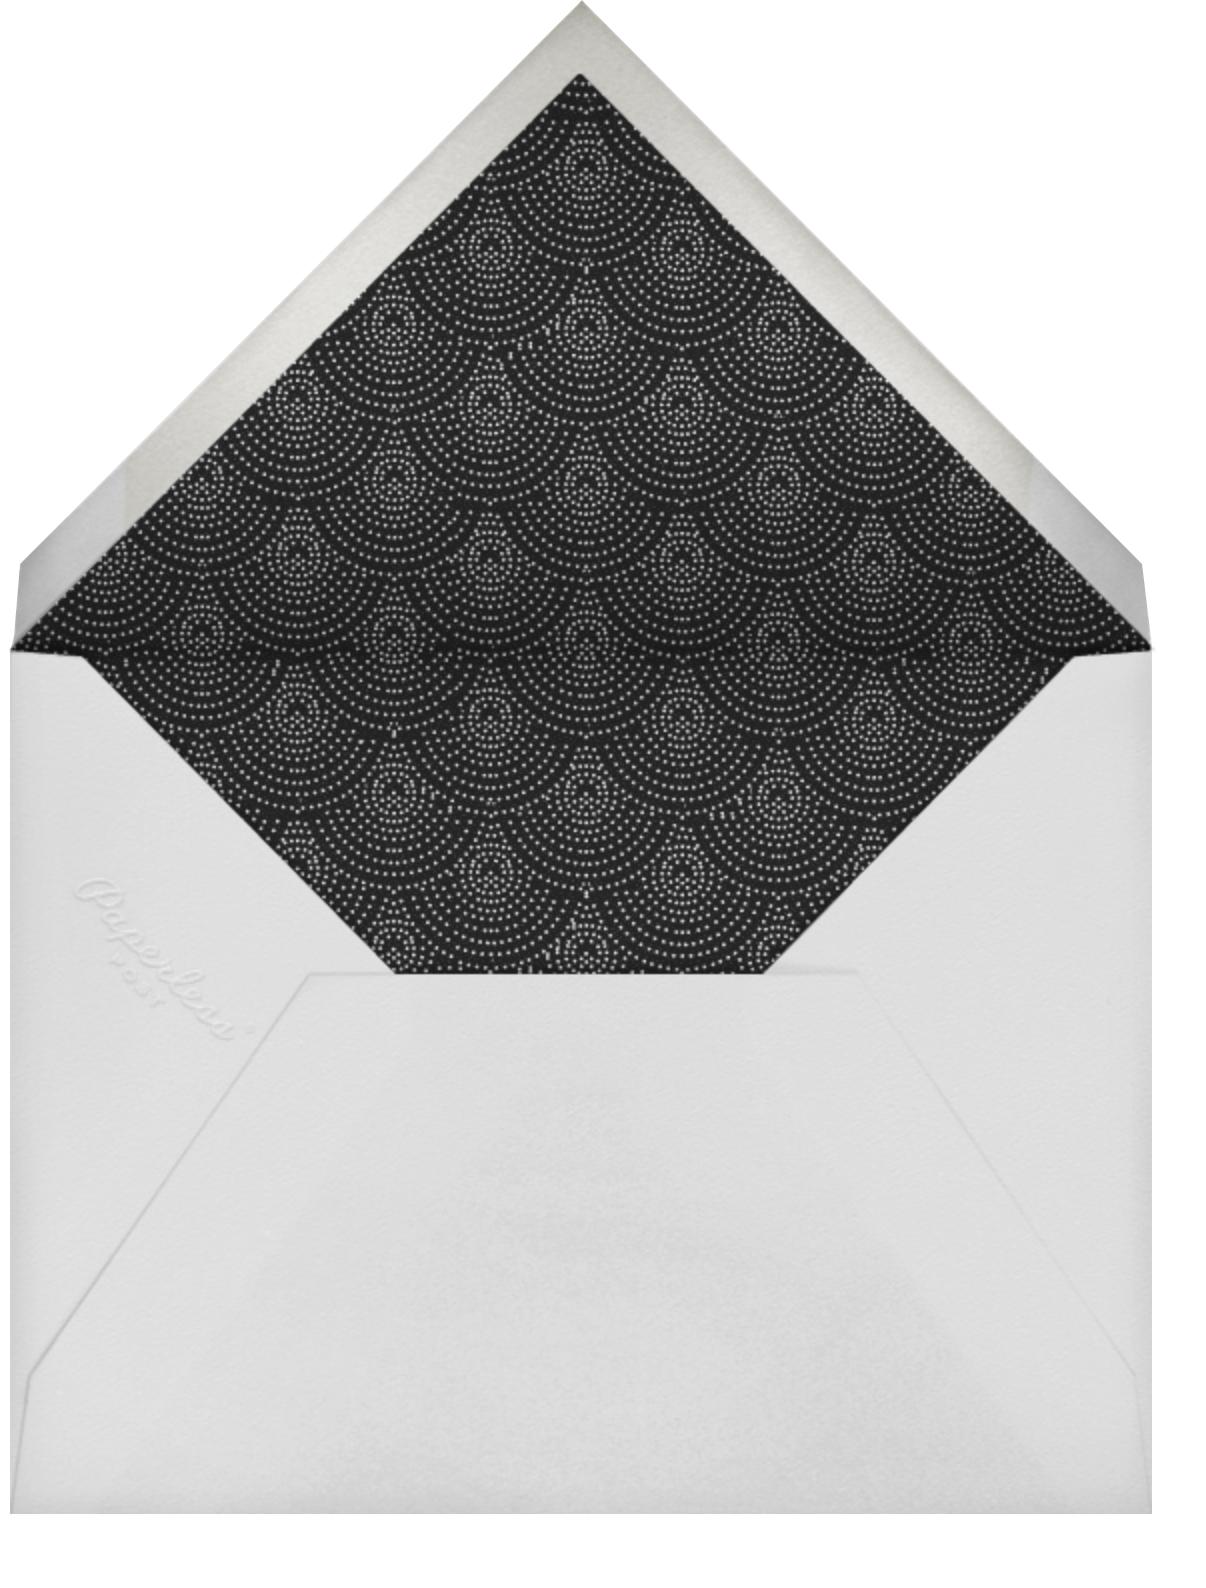 Croc Border - Forest Green - Paperless Post - Adult birthday - envelope back